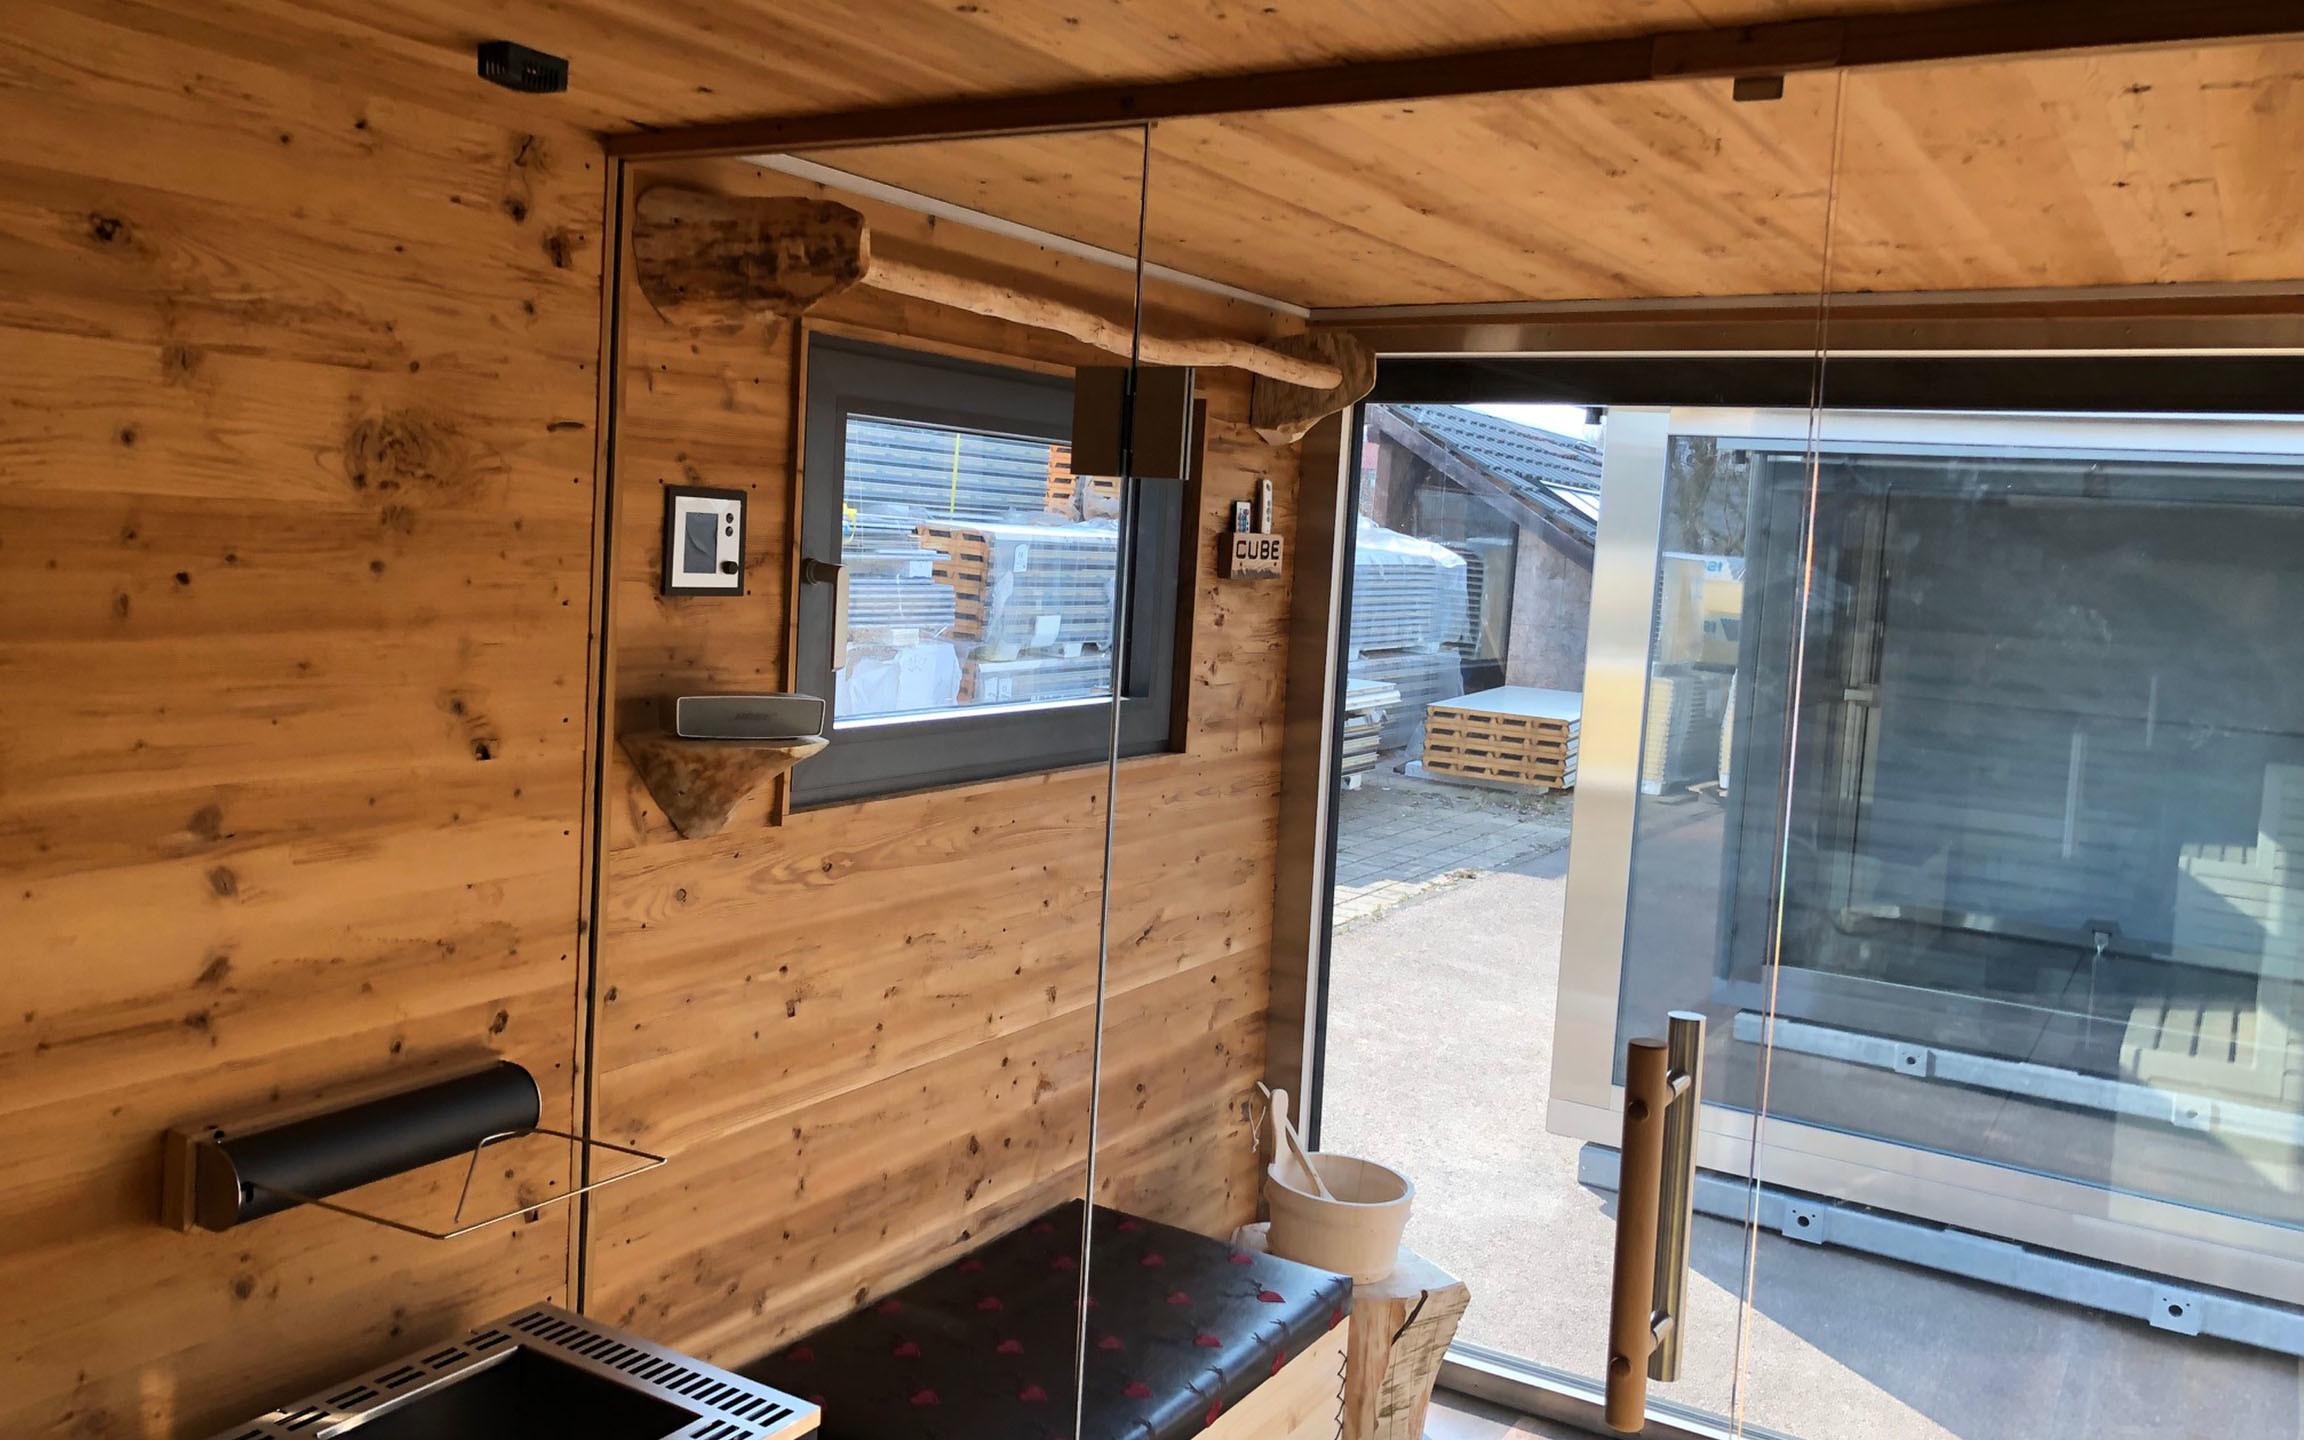 Full Size of Edelstahl Deluxe Gartensauna Altholz Cube Fsofort Verfgbar Whirlpool Garten Aufblasbar Bewässerung Automatisch Gewächshaus Spielhaus Holz Feuerstelle Garten Garten Sauna